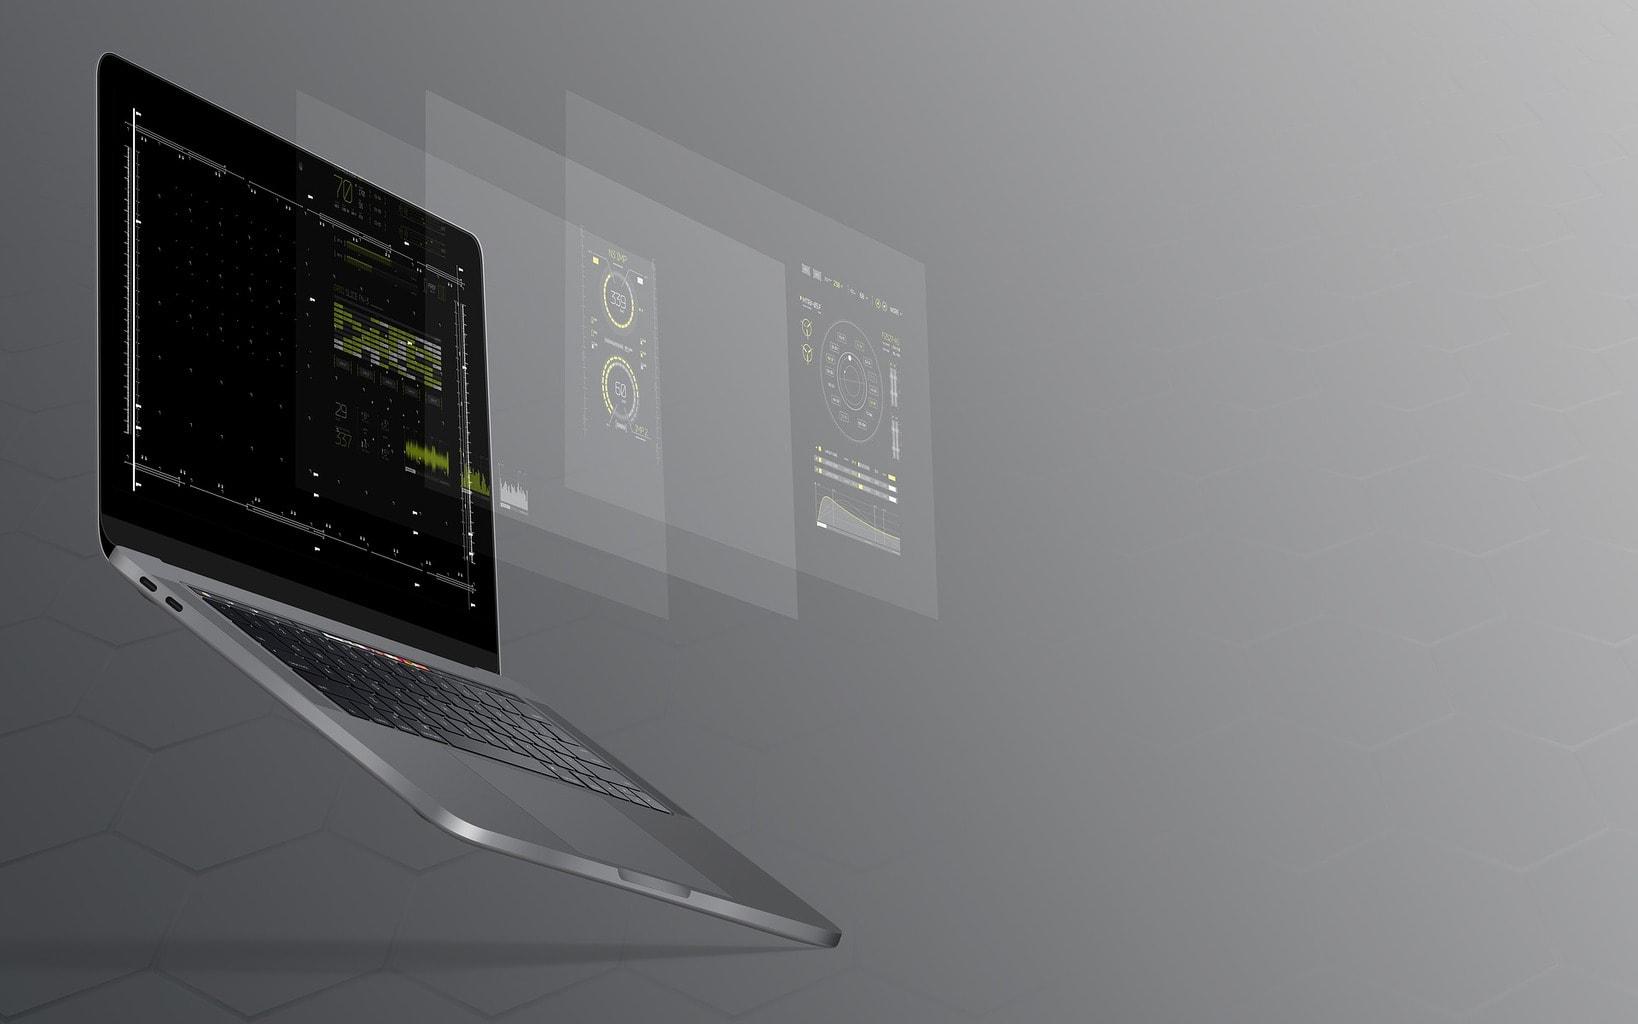 laptop 3174729 1920